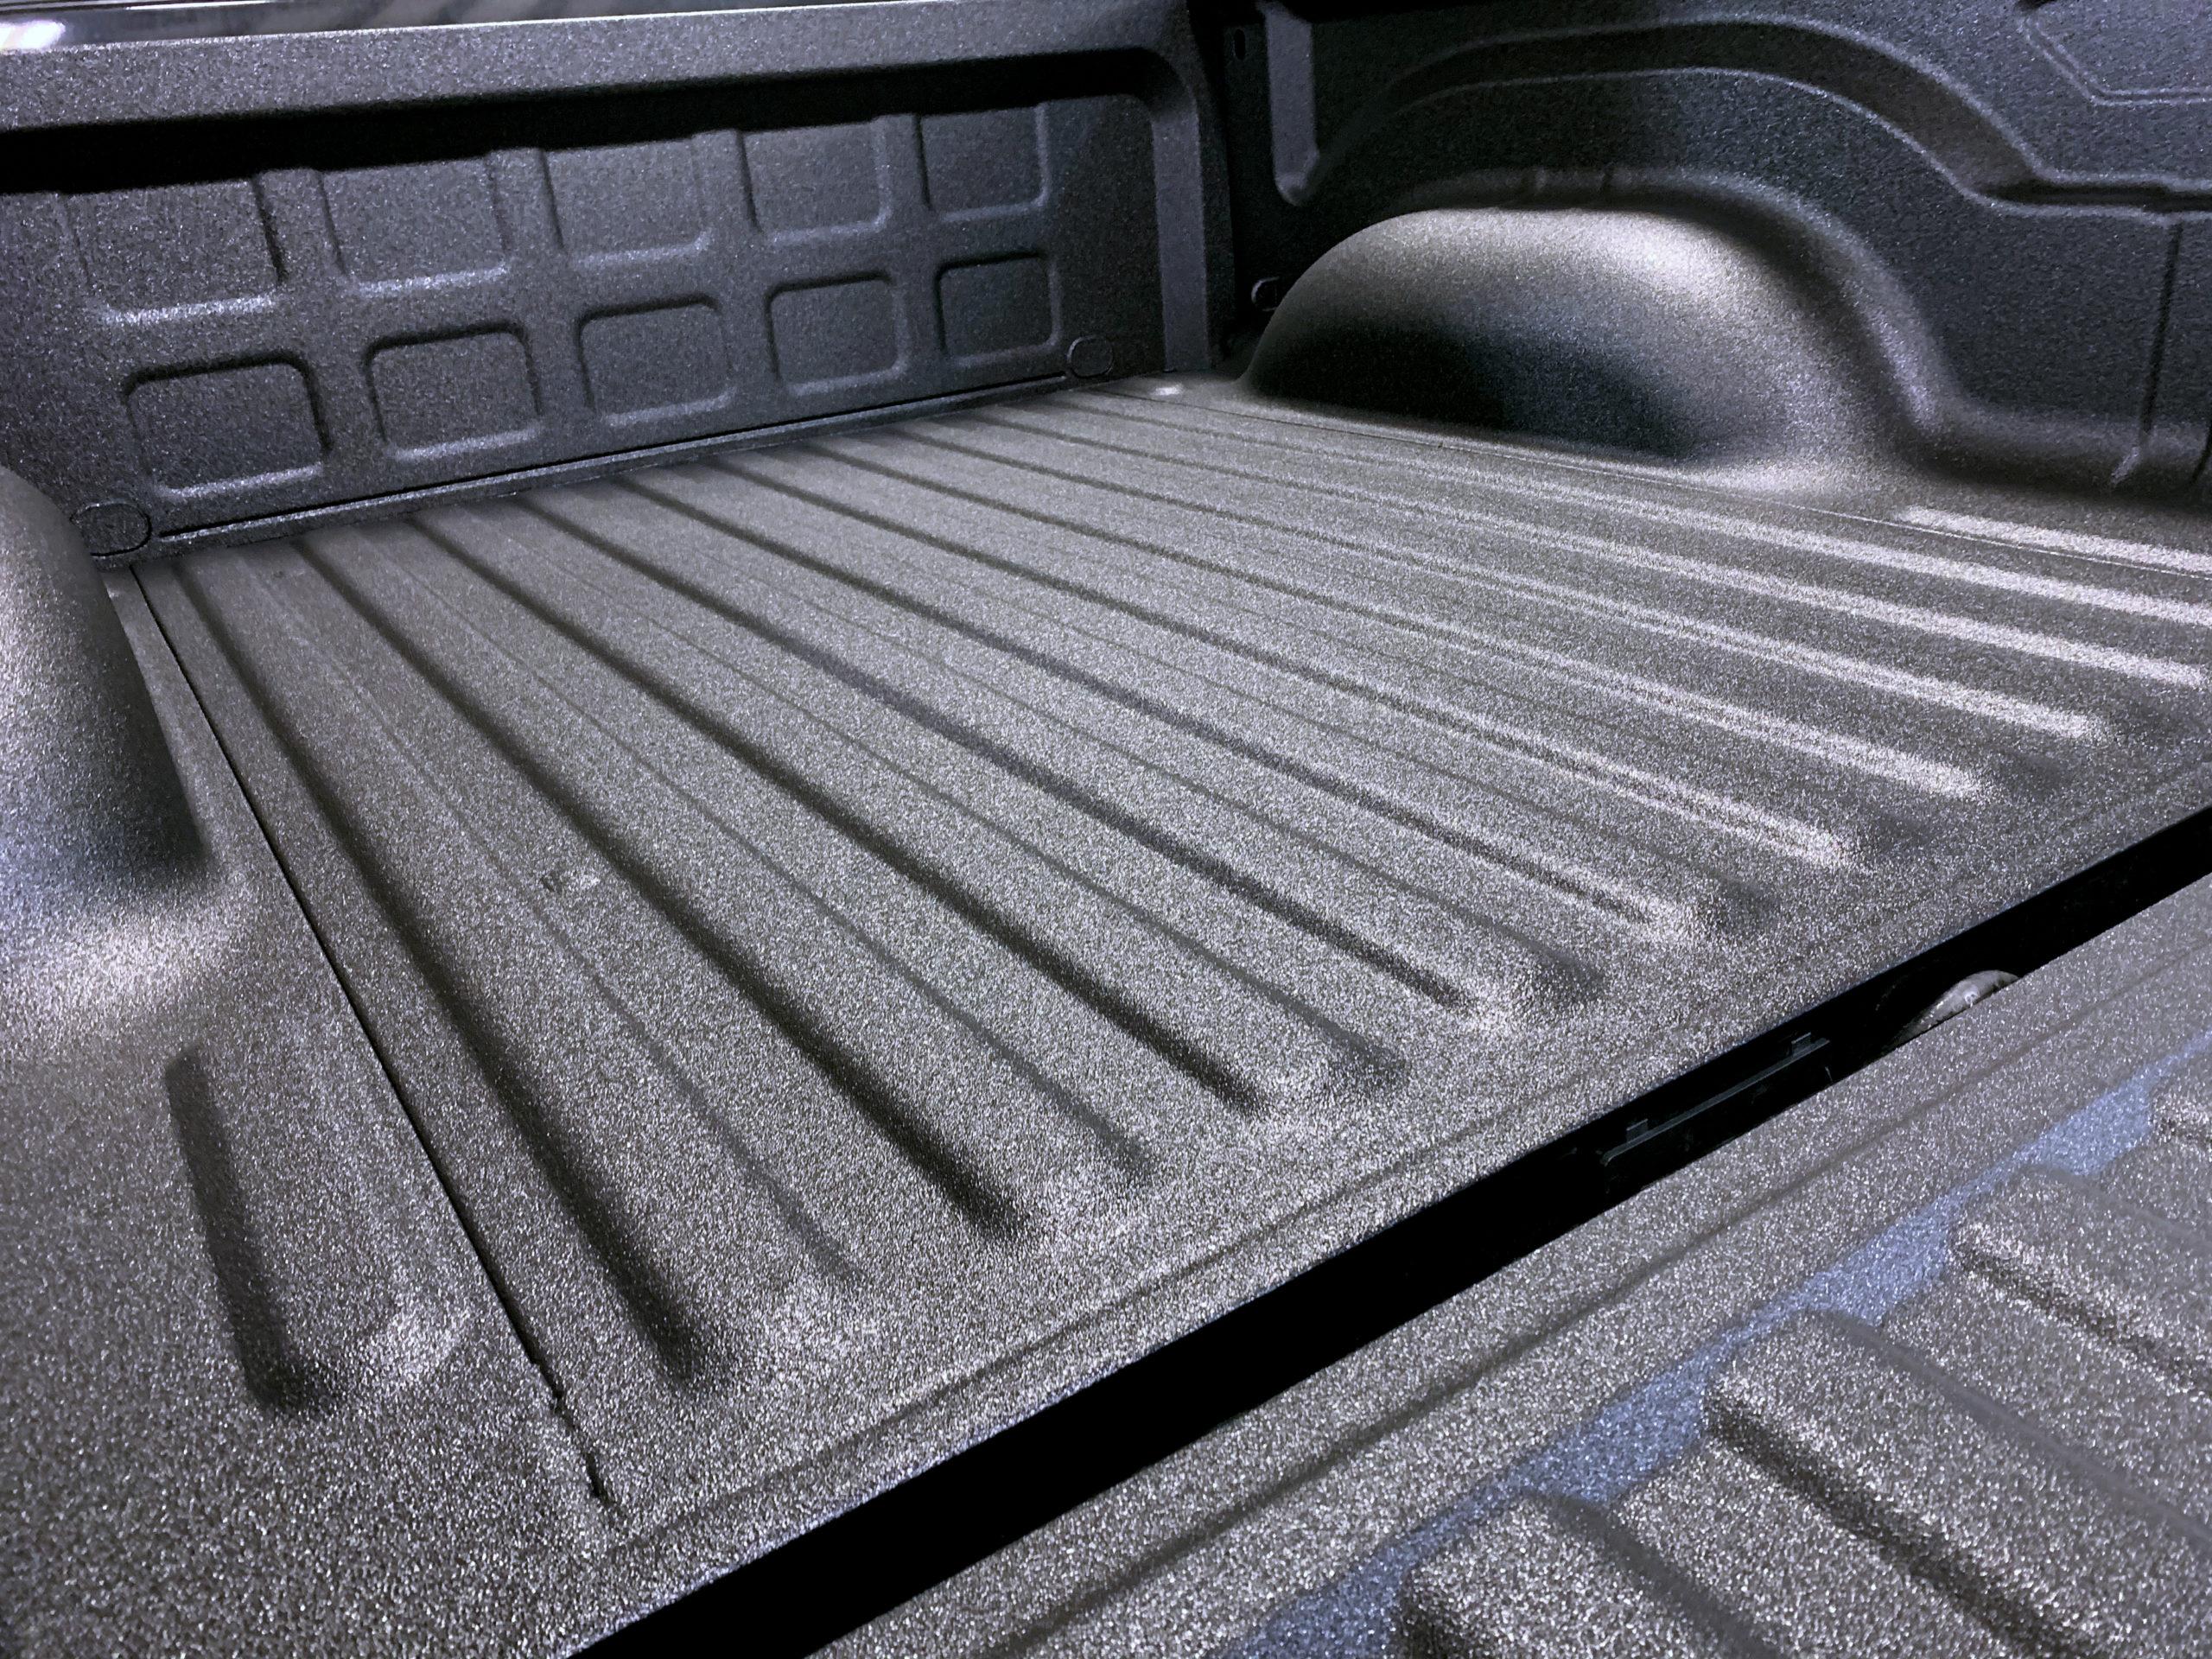 Buy Spray-on Truck Bed Liner Online | Autoplex Restyling Centers |  Northglenn, Longmont, Loveland